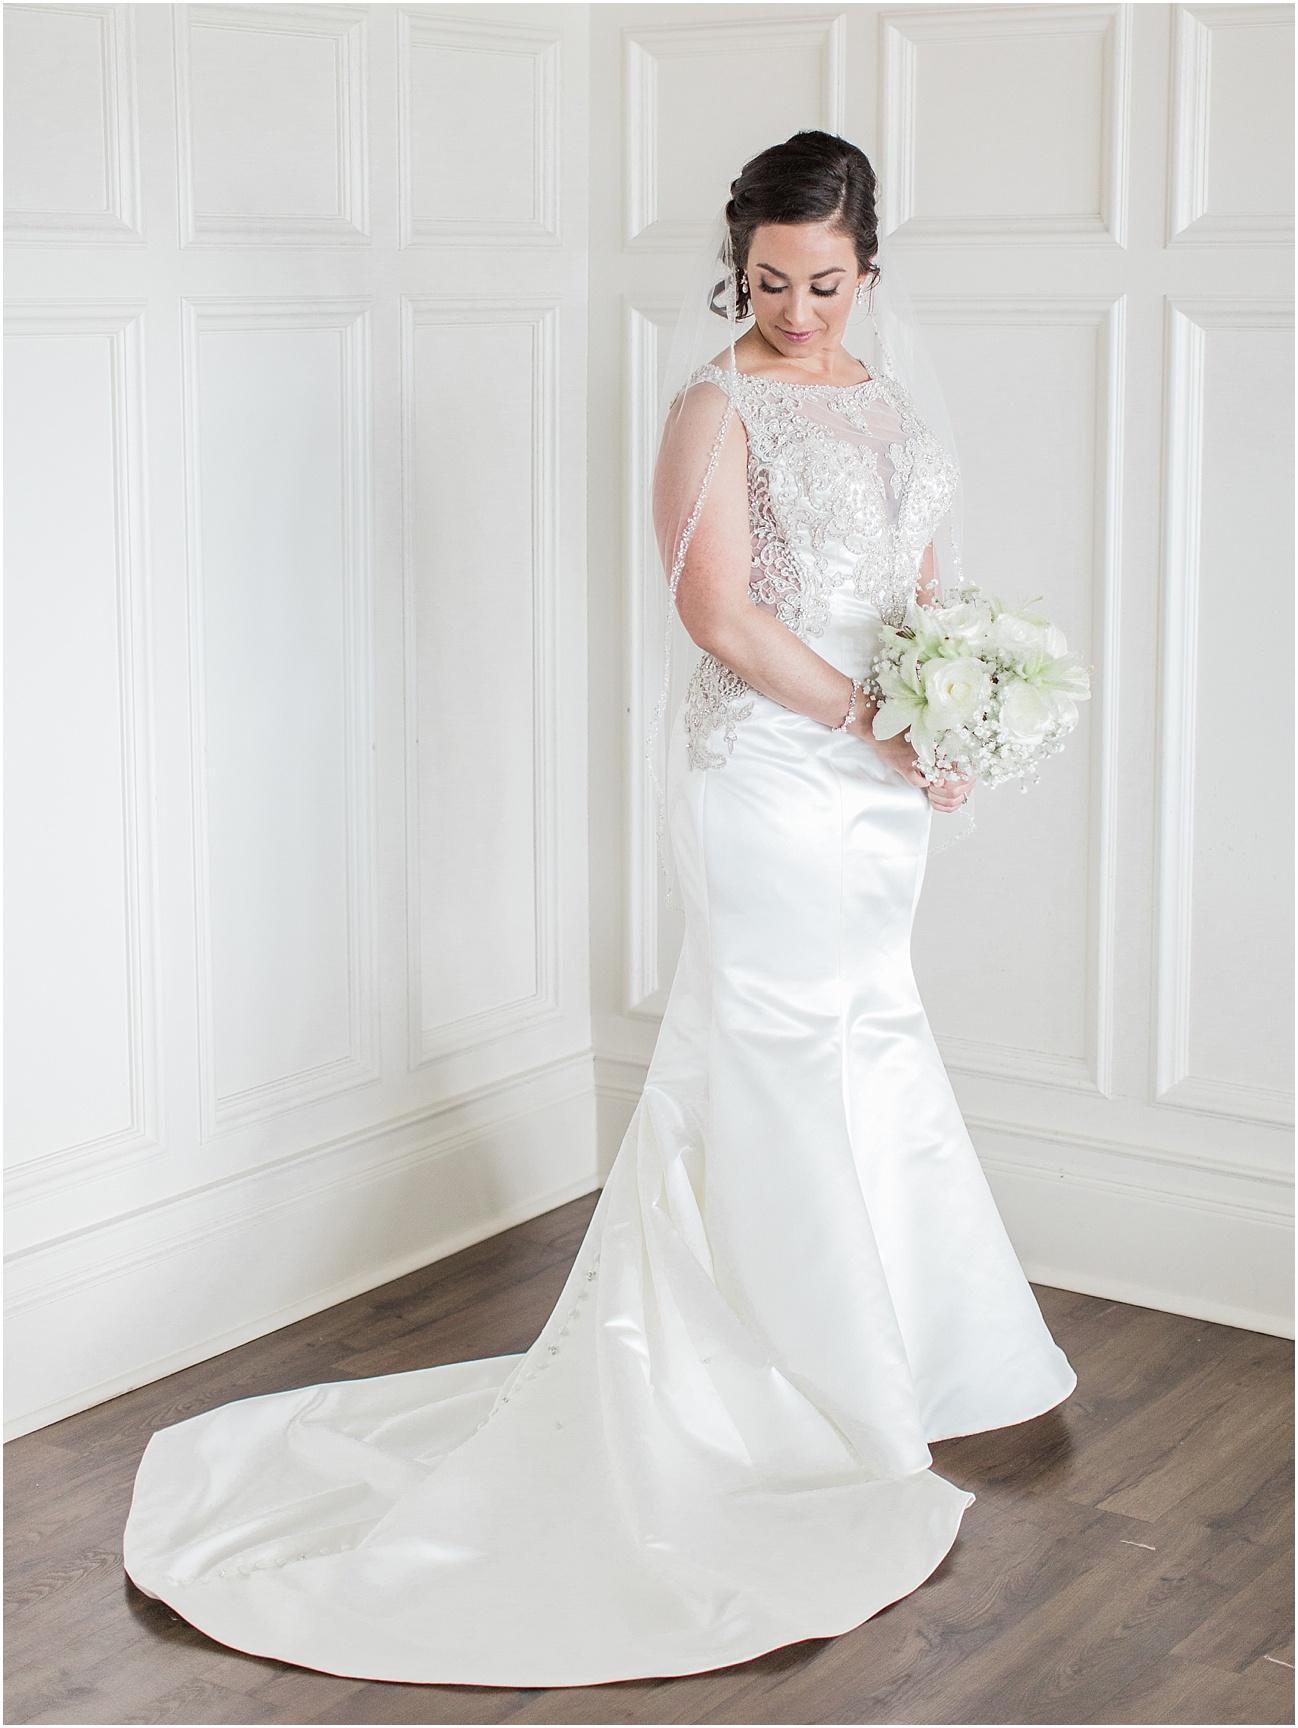 nicole_stephen_cape_club_nicky_falmouth_cod_boston_wedding_photographer_meredith_jane_photography_photo_0204.jpg